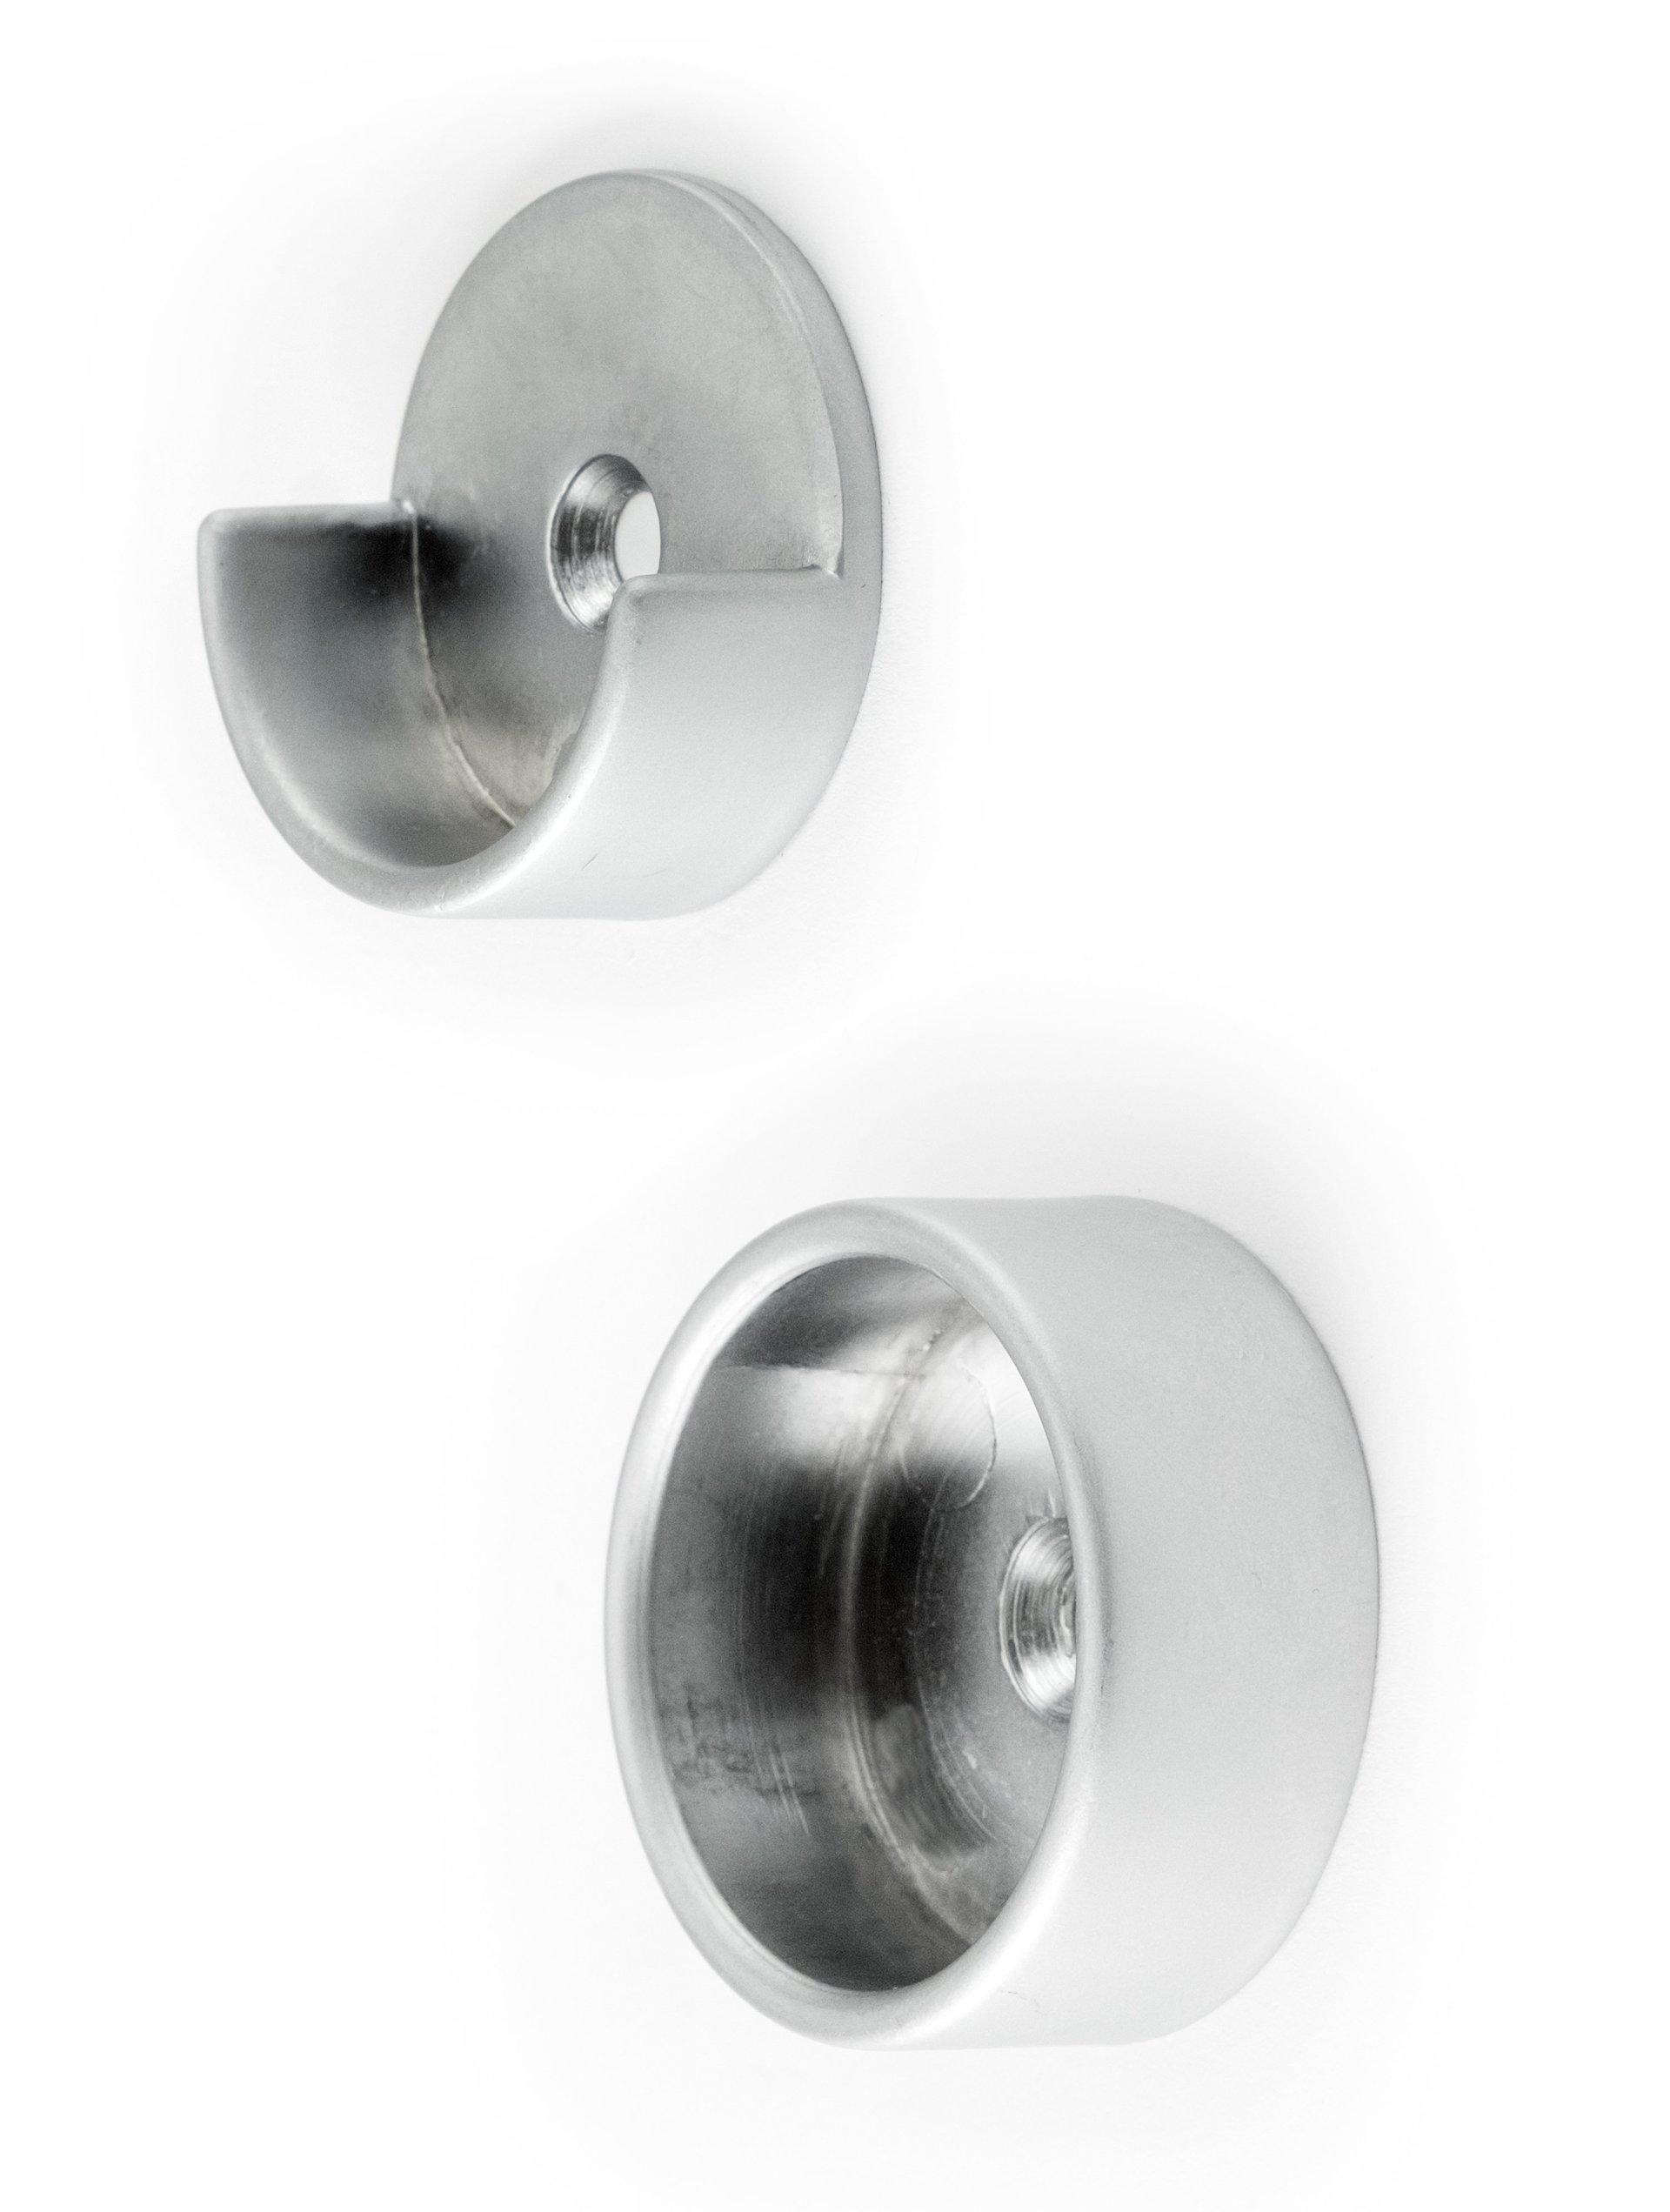 Brushed Chrome Closet Pole Cups